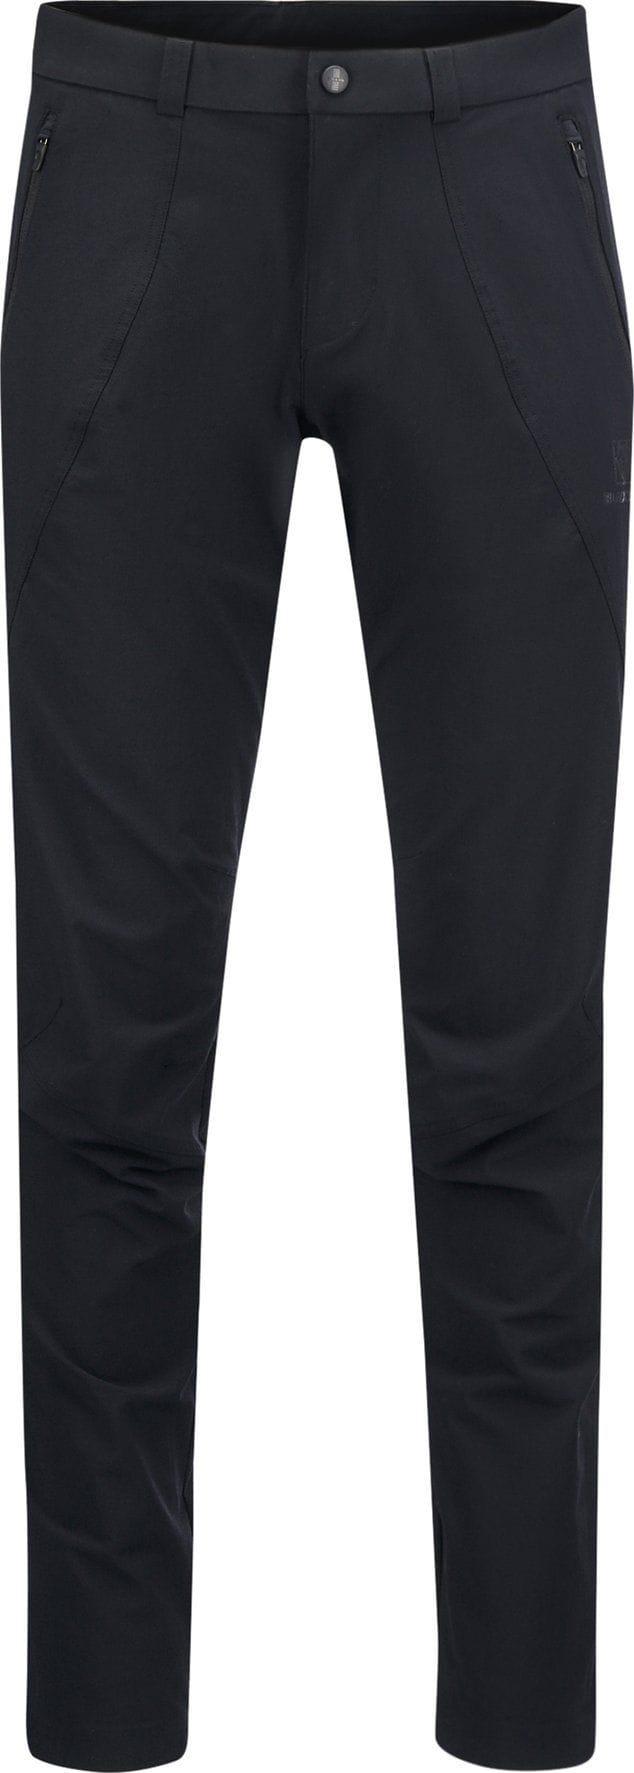 Blackyak Randall Pants